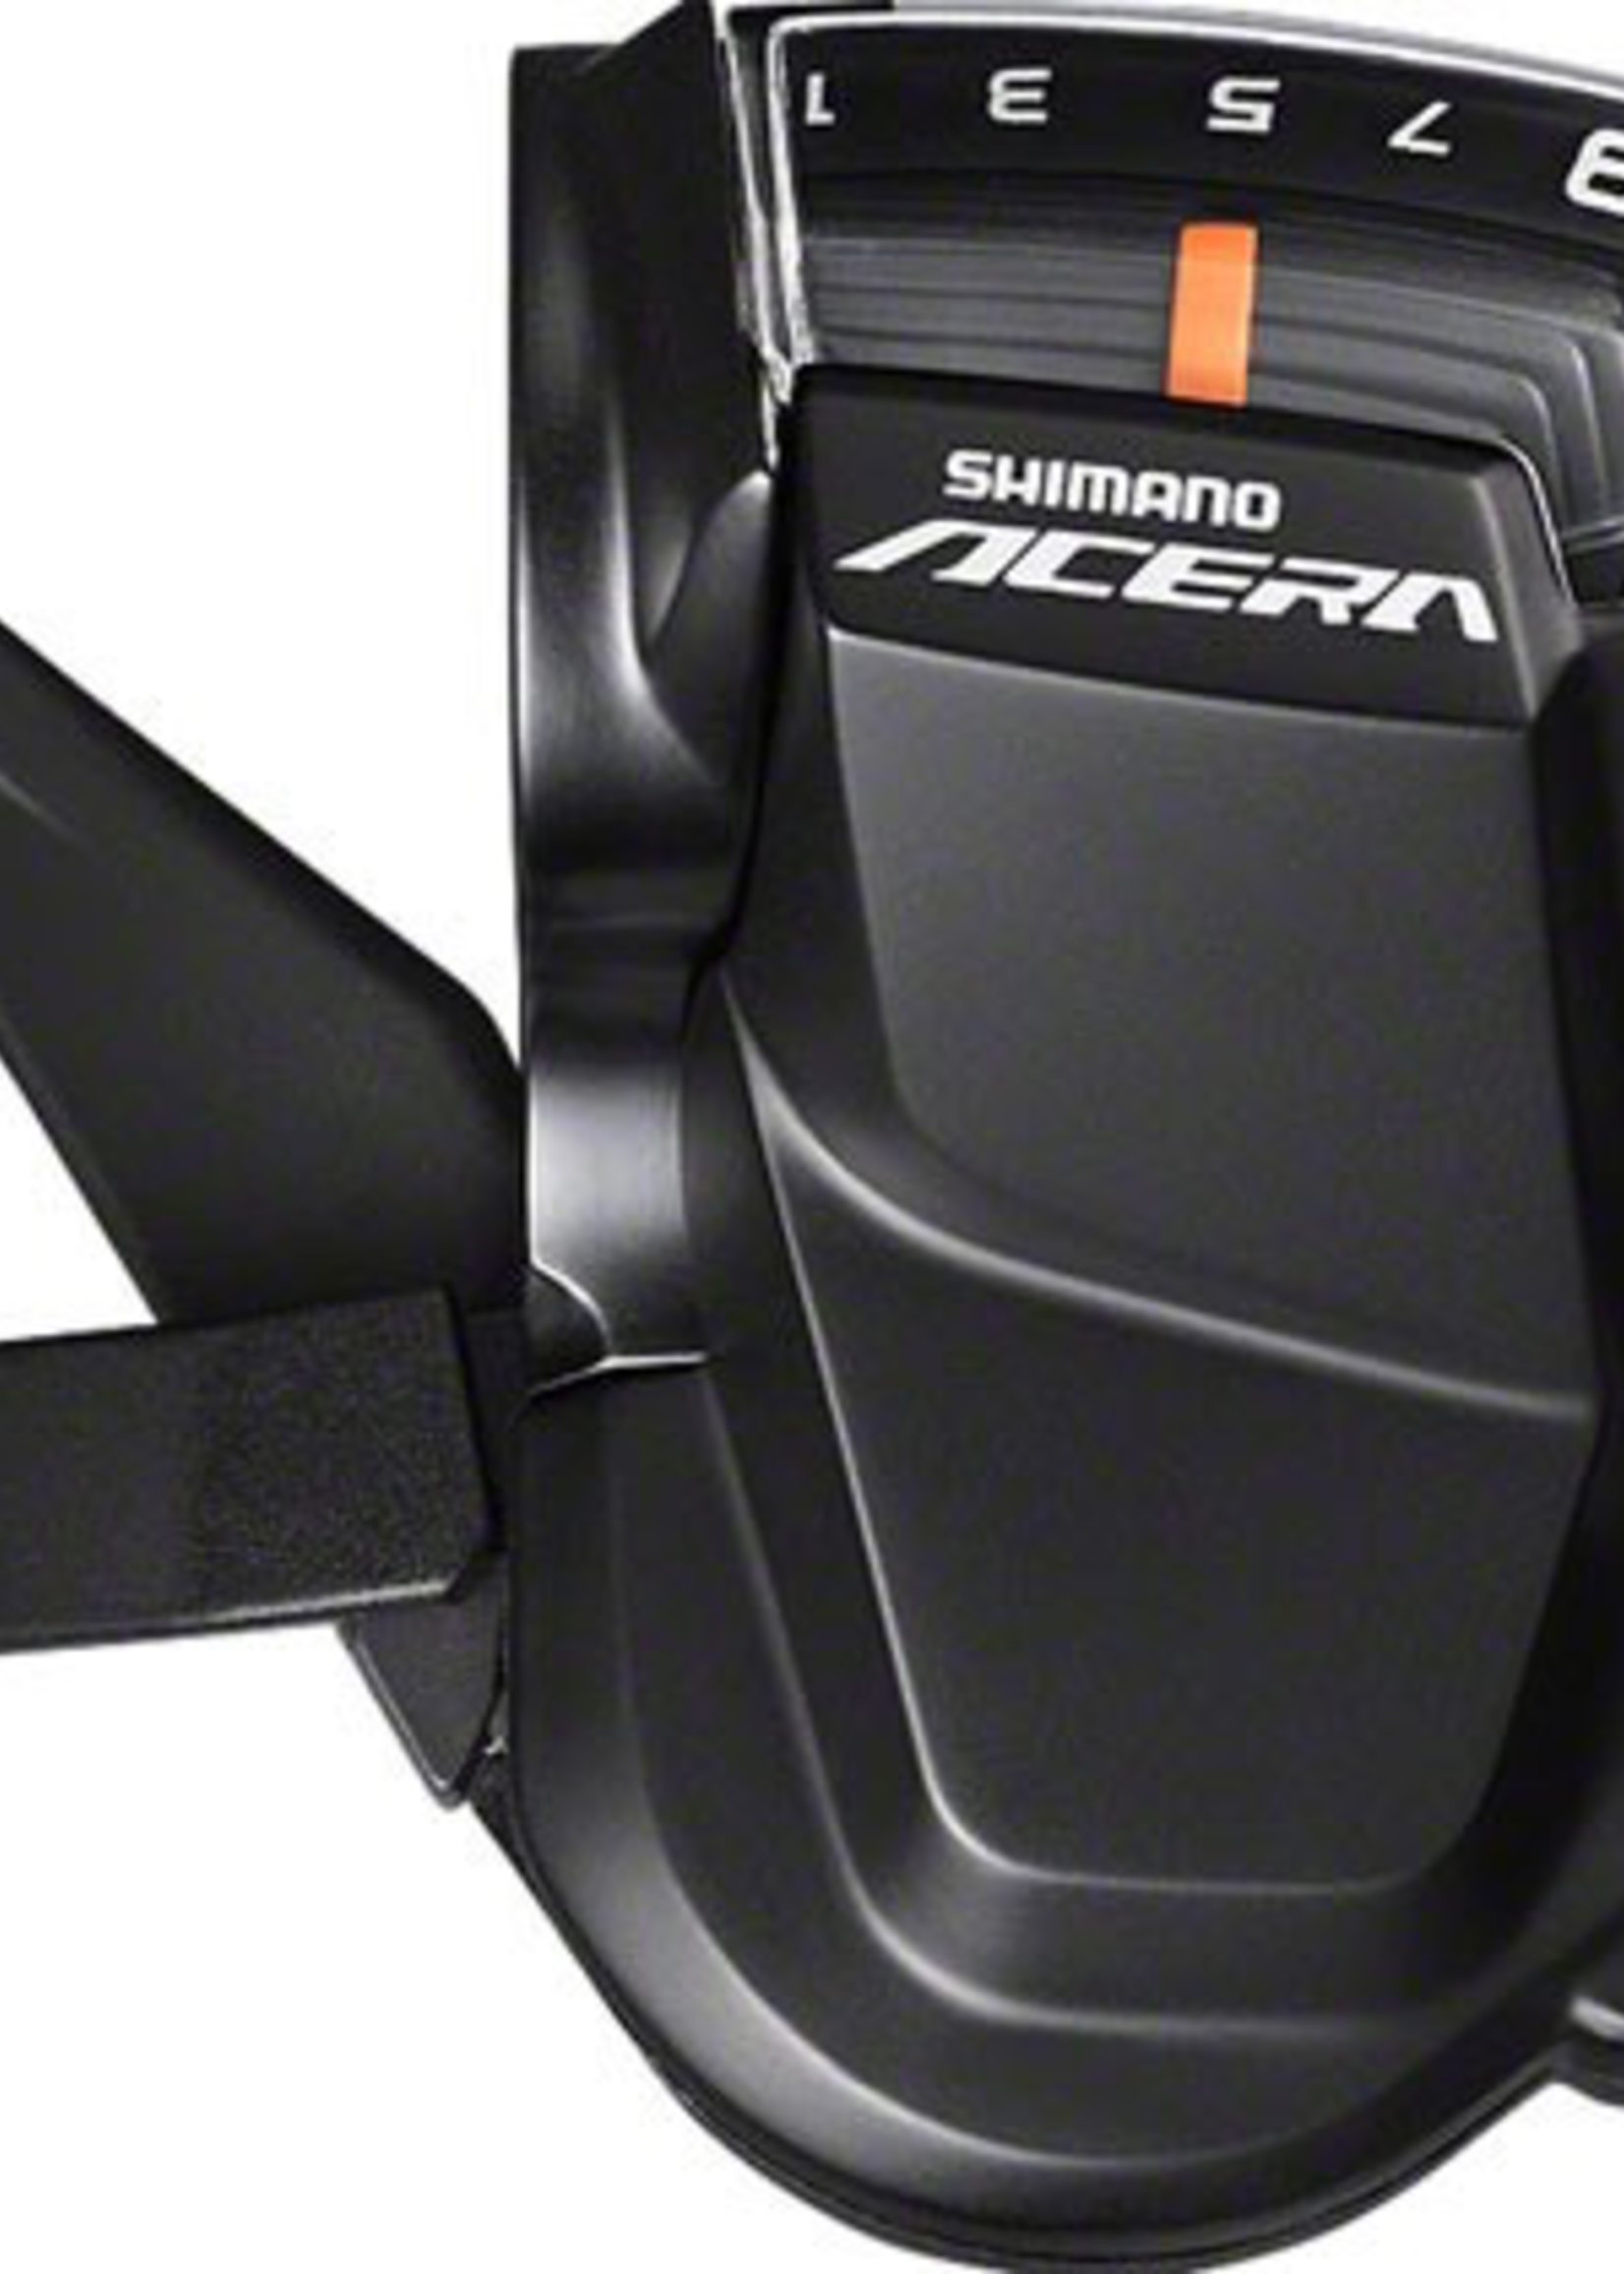 Shimano ACERA SL-M390 3X9 SHIFTER SET